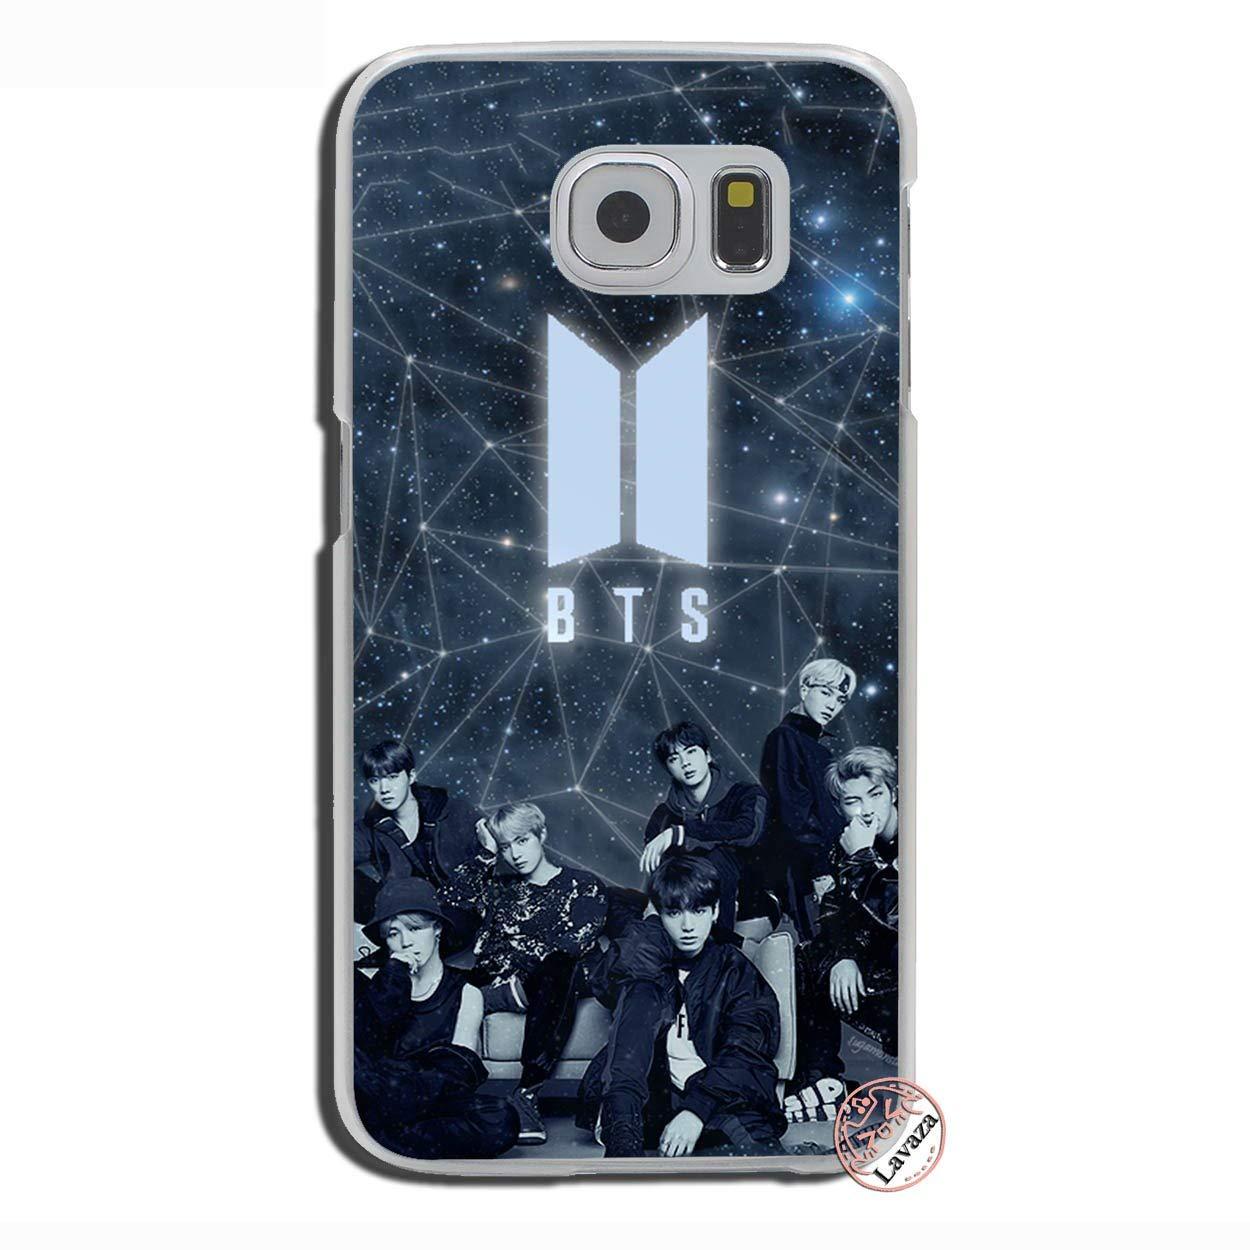 LLM 2 BTS Star Love Yourself Face Love Kpop Bangtan Boys Band Korean Rapmonster Jin Suga J-Hope Jimin V Jungkook Music Transparent Hard Cover Case for ...